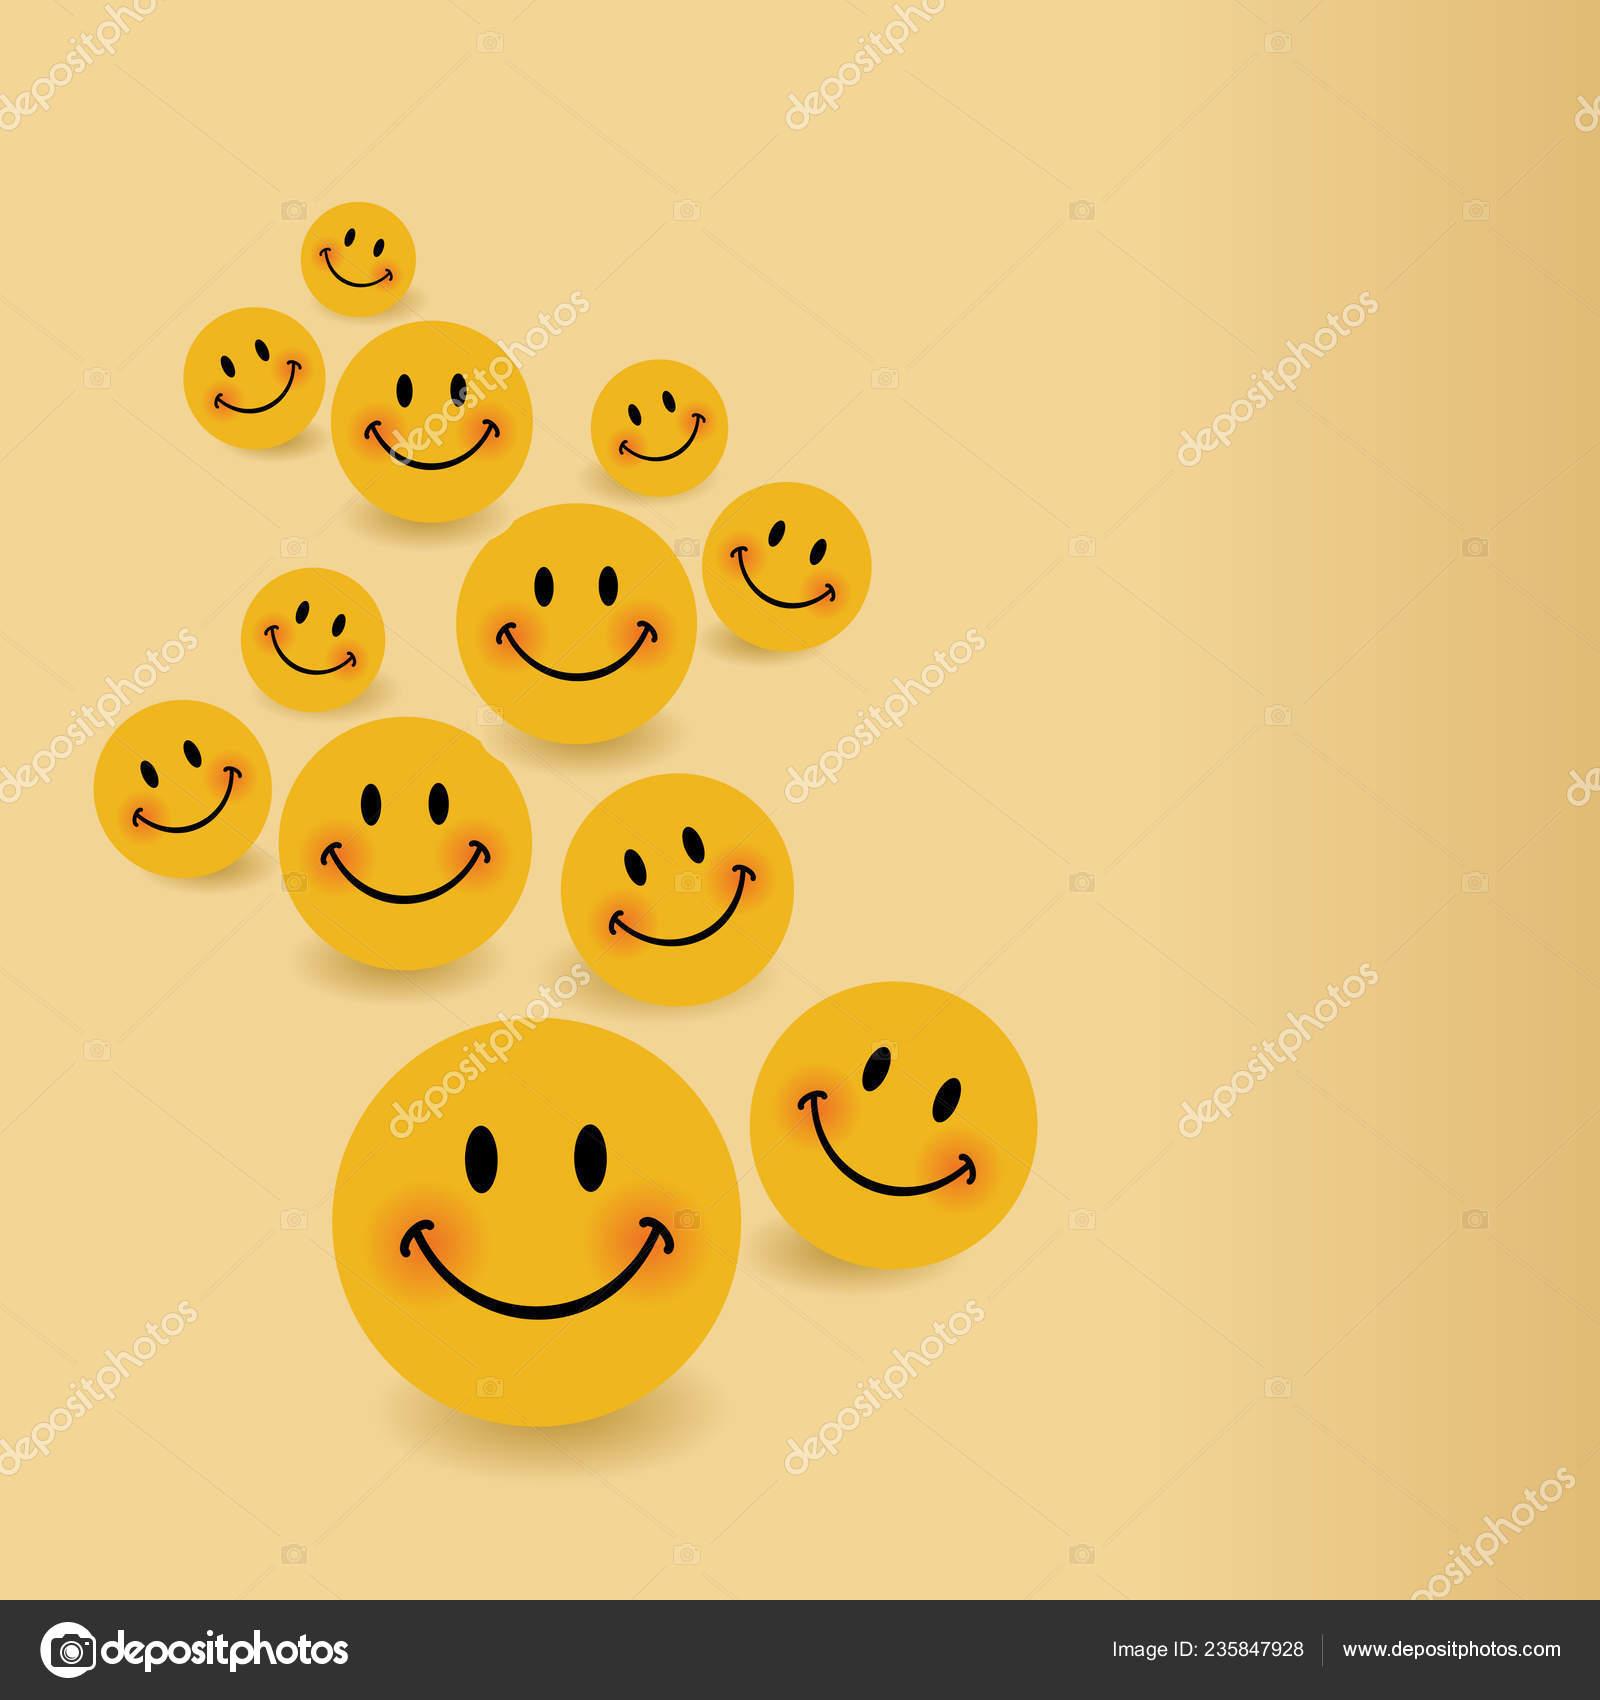 Smile Icon Background Template Smiley Faces Design